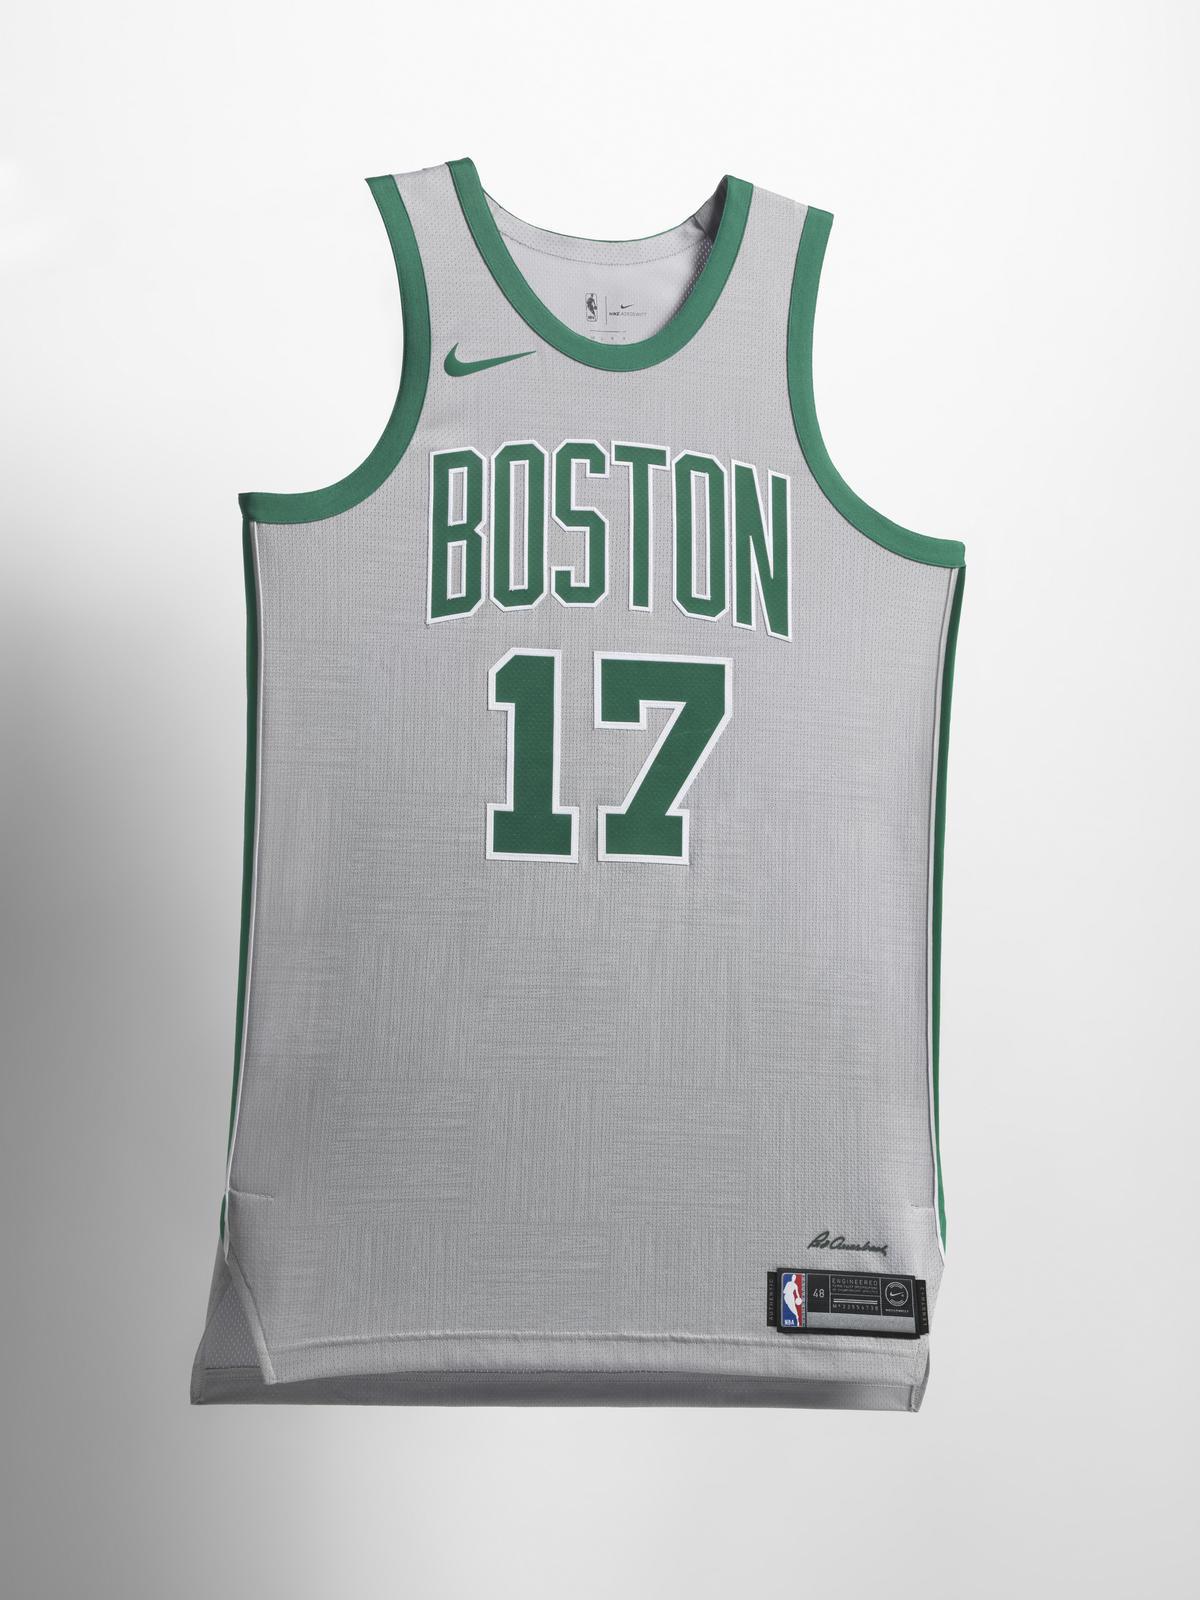 Nike_NBA_City_Edition_Uniform_Boston_Celtics_0077_native_1600